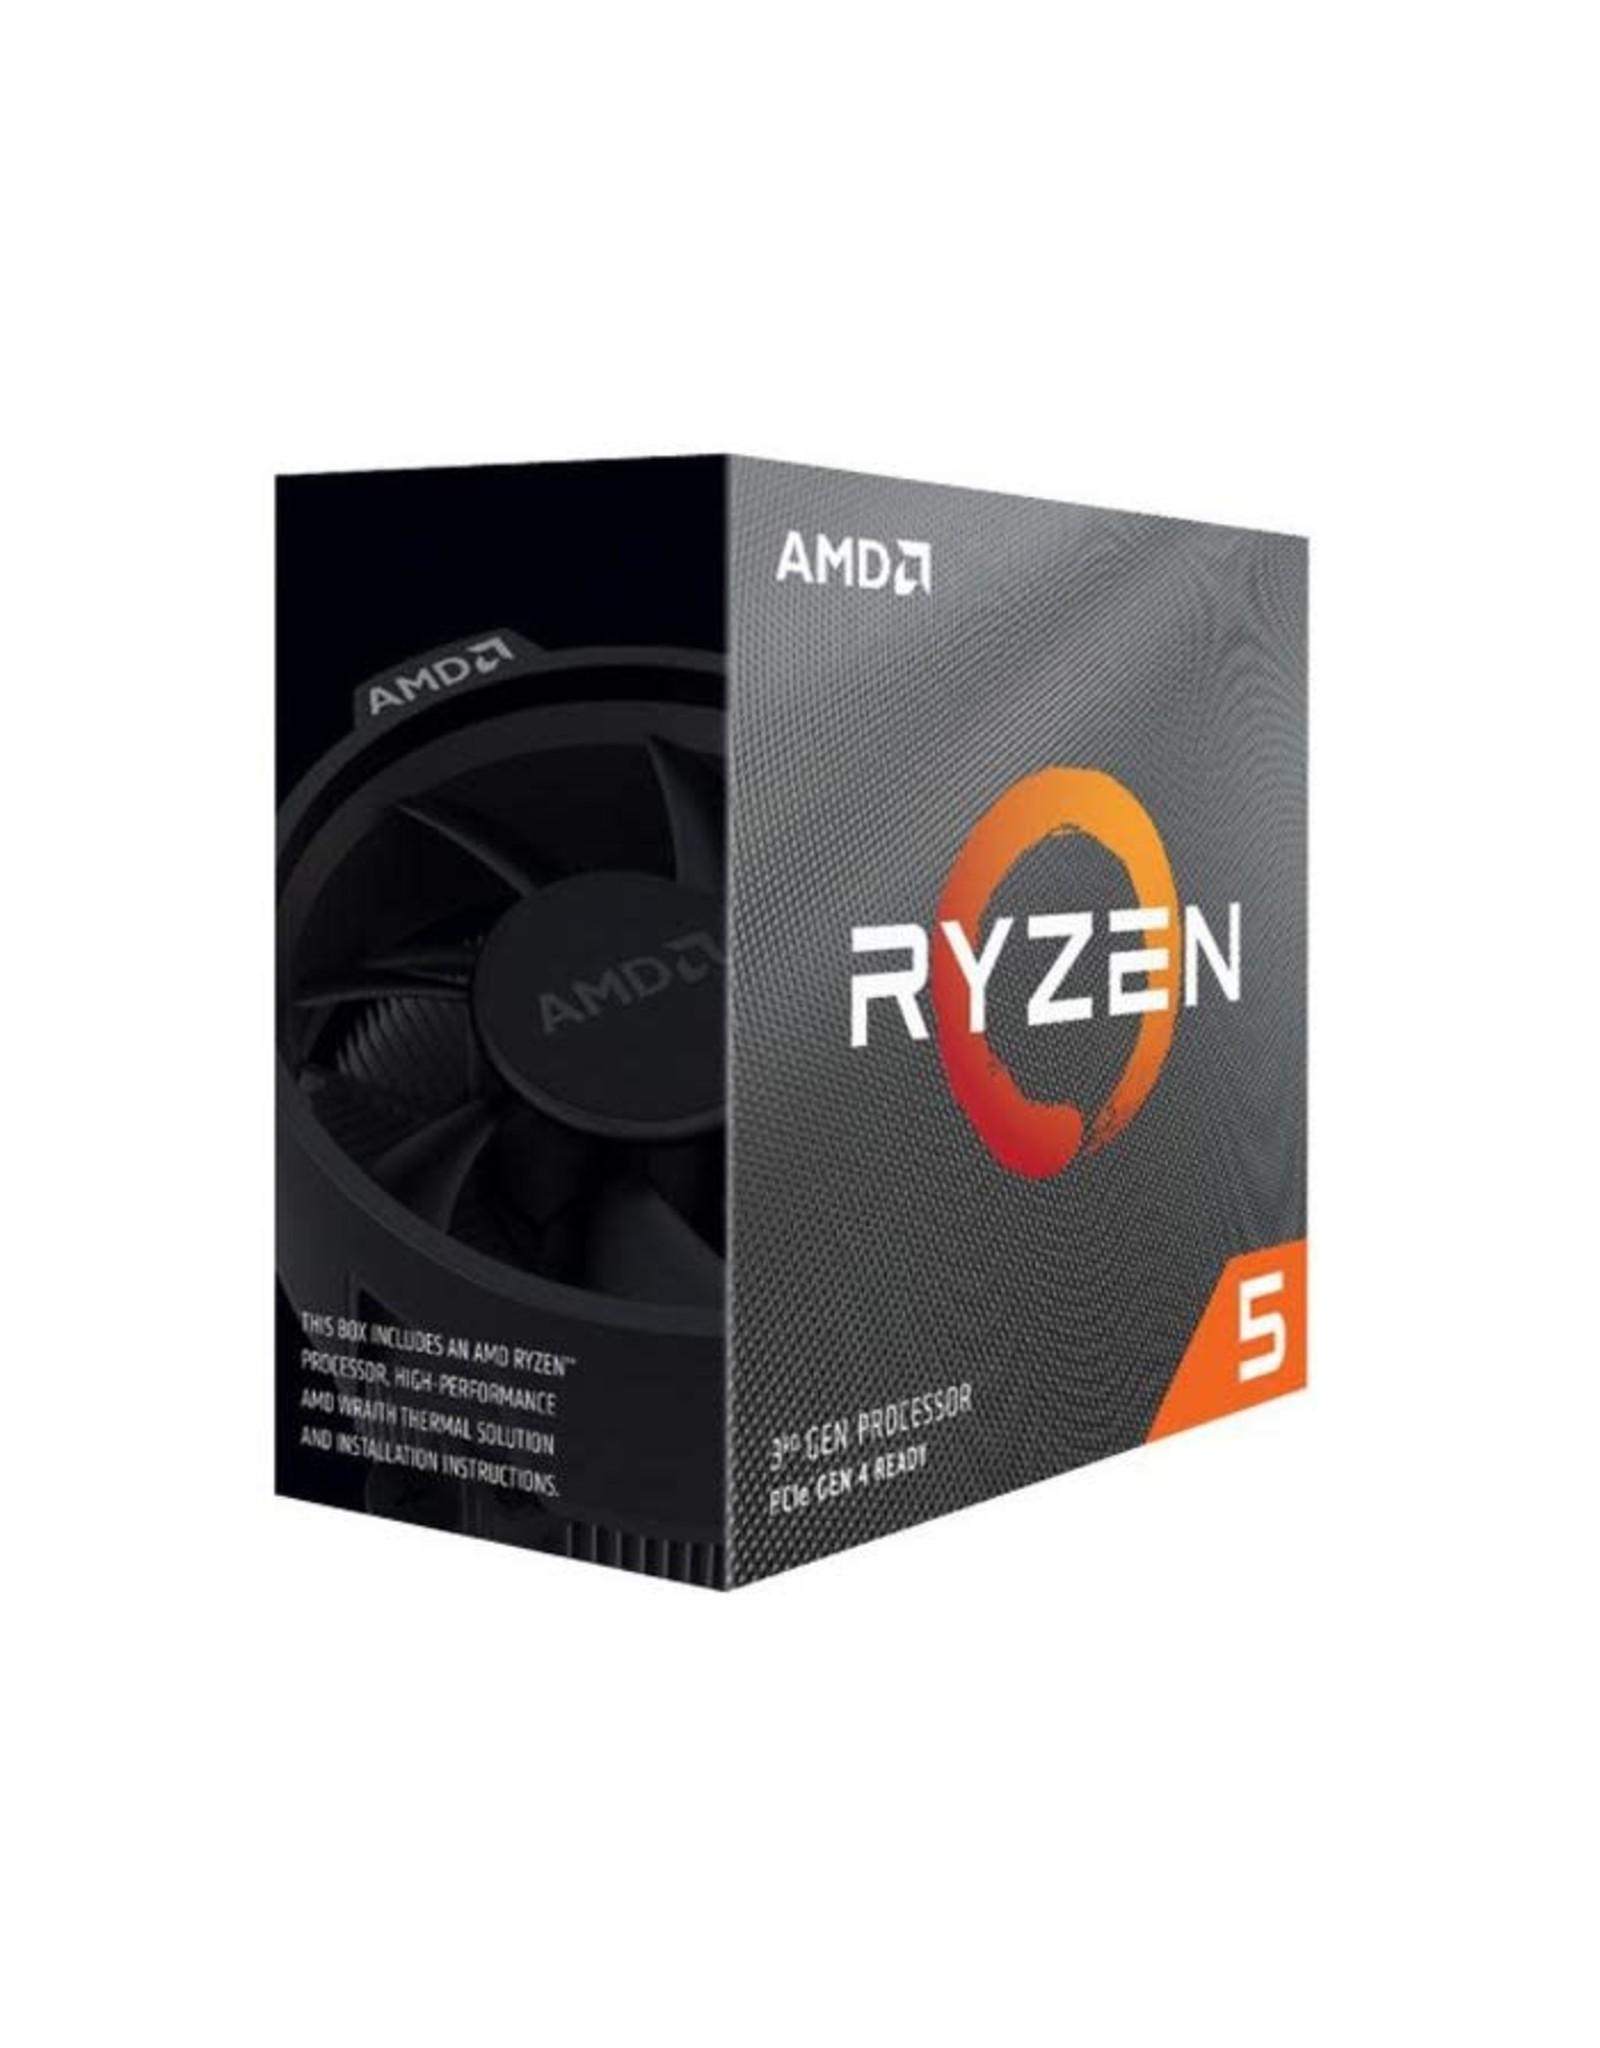 AMD AMD Ryzen 5 3600 with Cooler